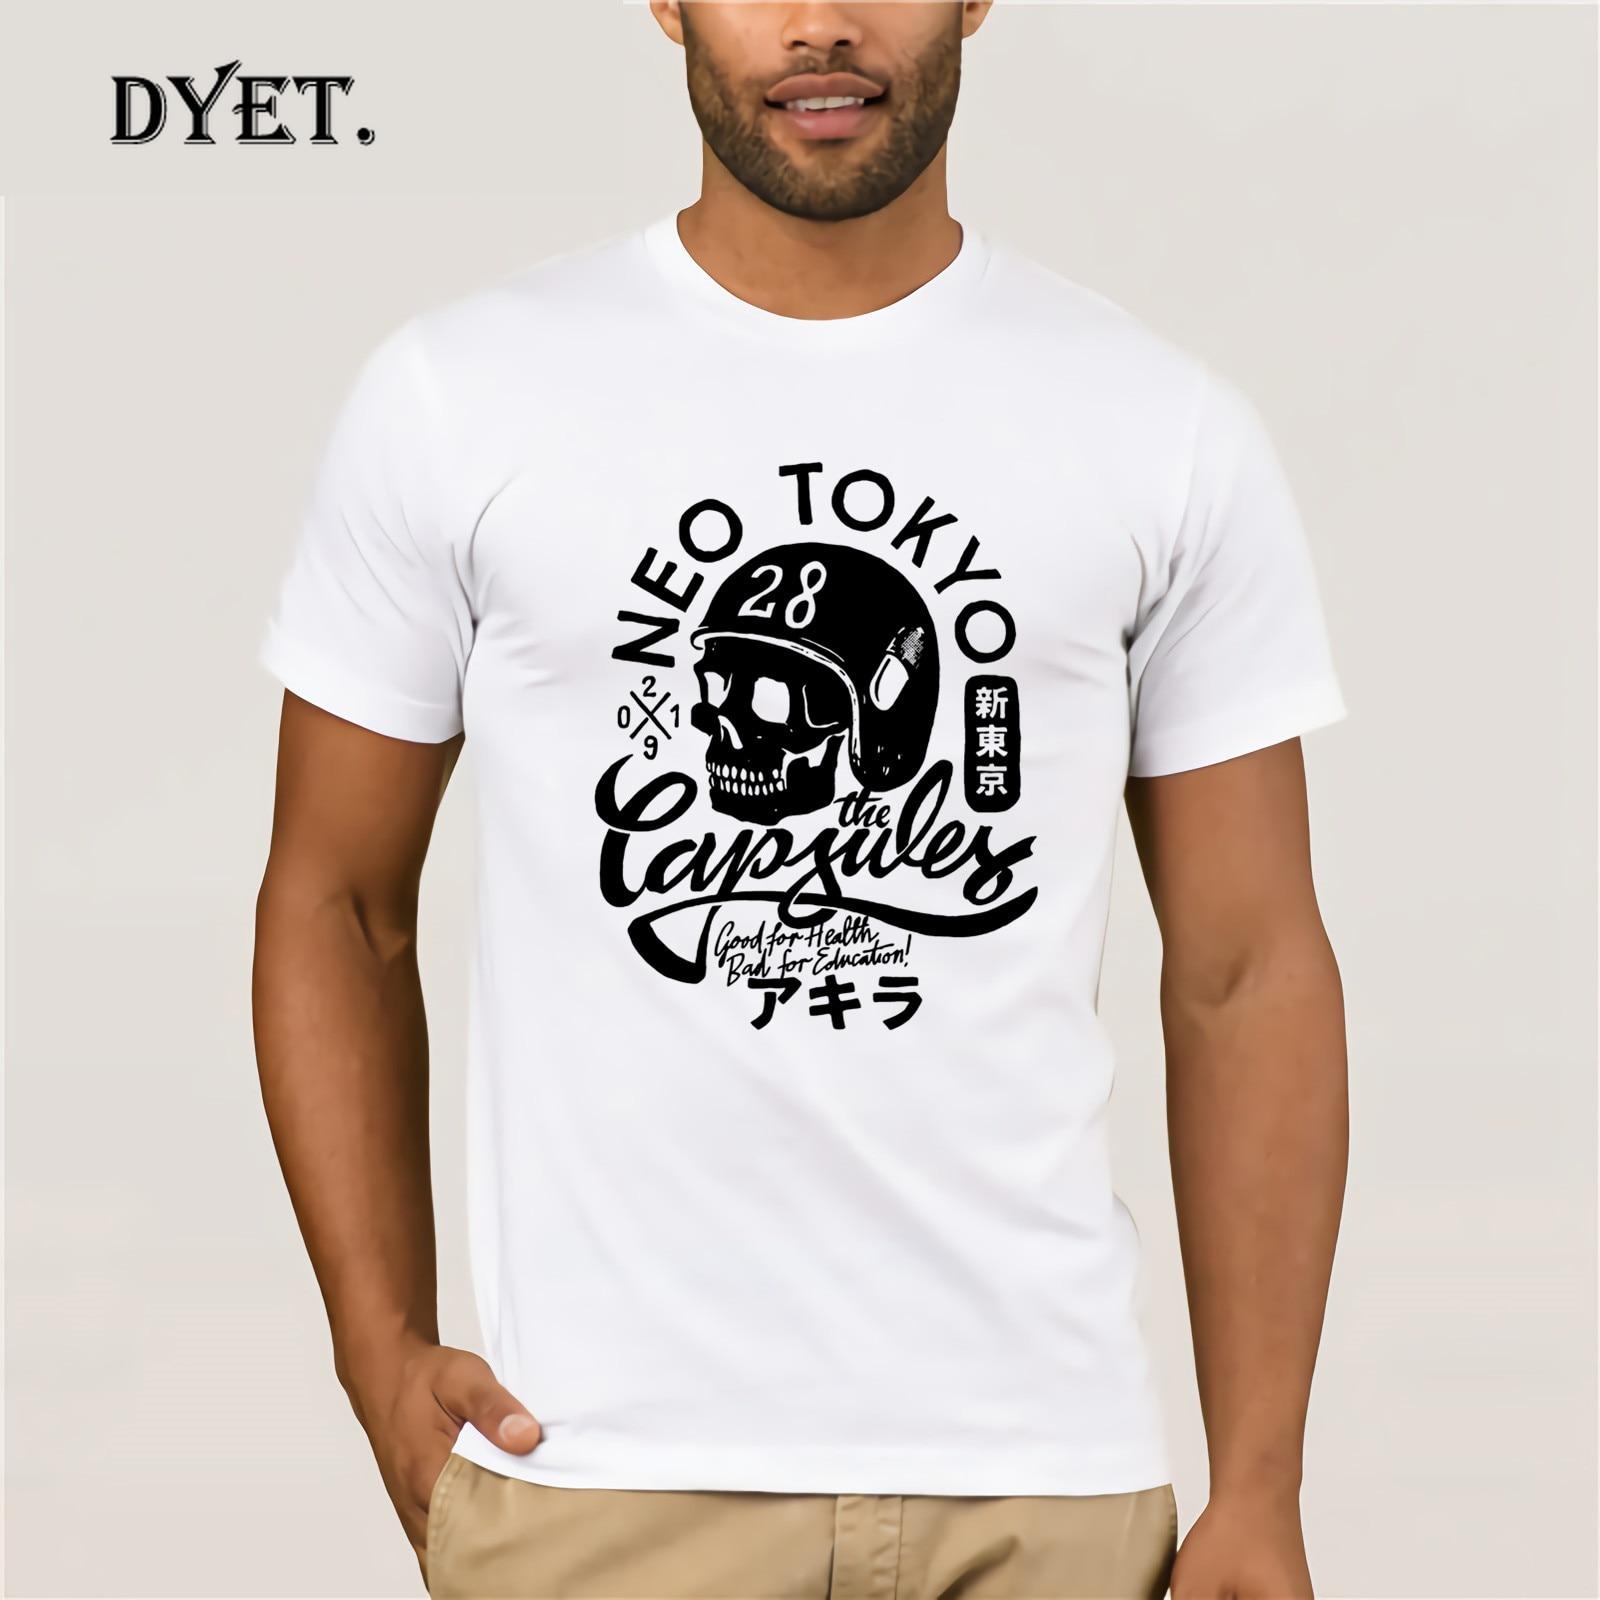 Camiseta de Akira, Camiseta informal de Anime japonés, Camiseta de talla grande,...